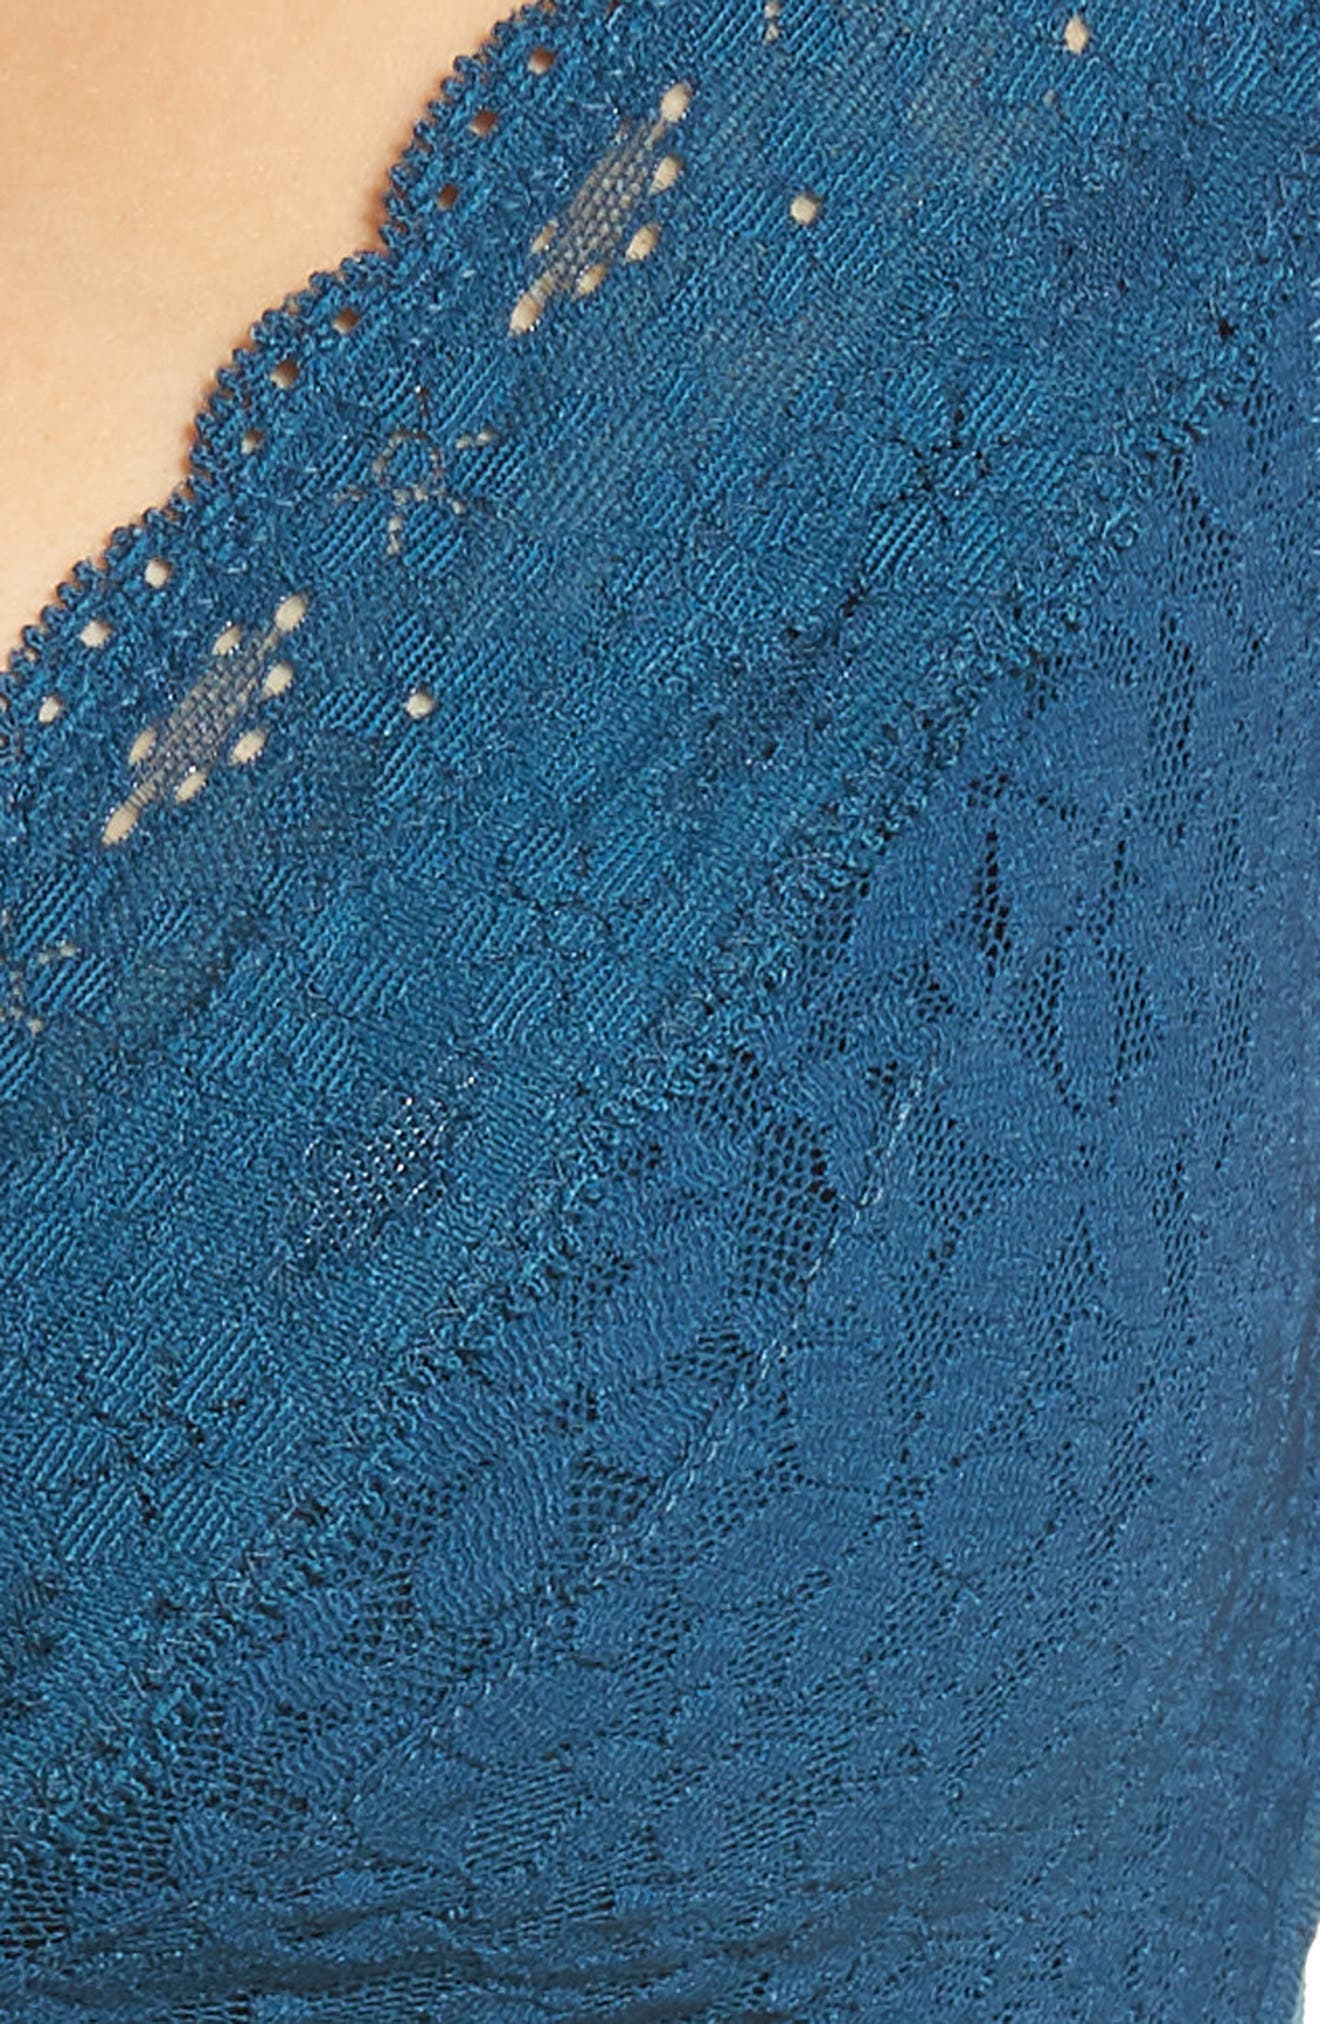 Halo Lace Bralette,                             Alternate thumbnail 8, color,                             MAJOLICA BLUE